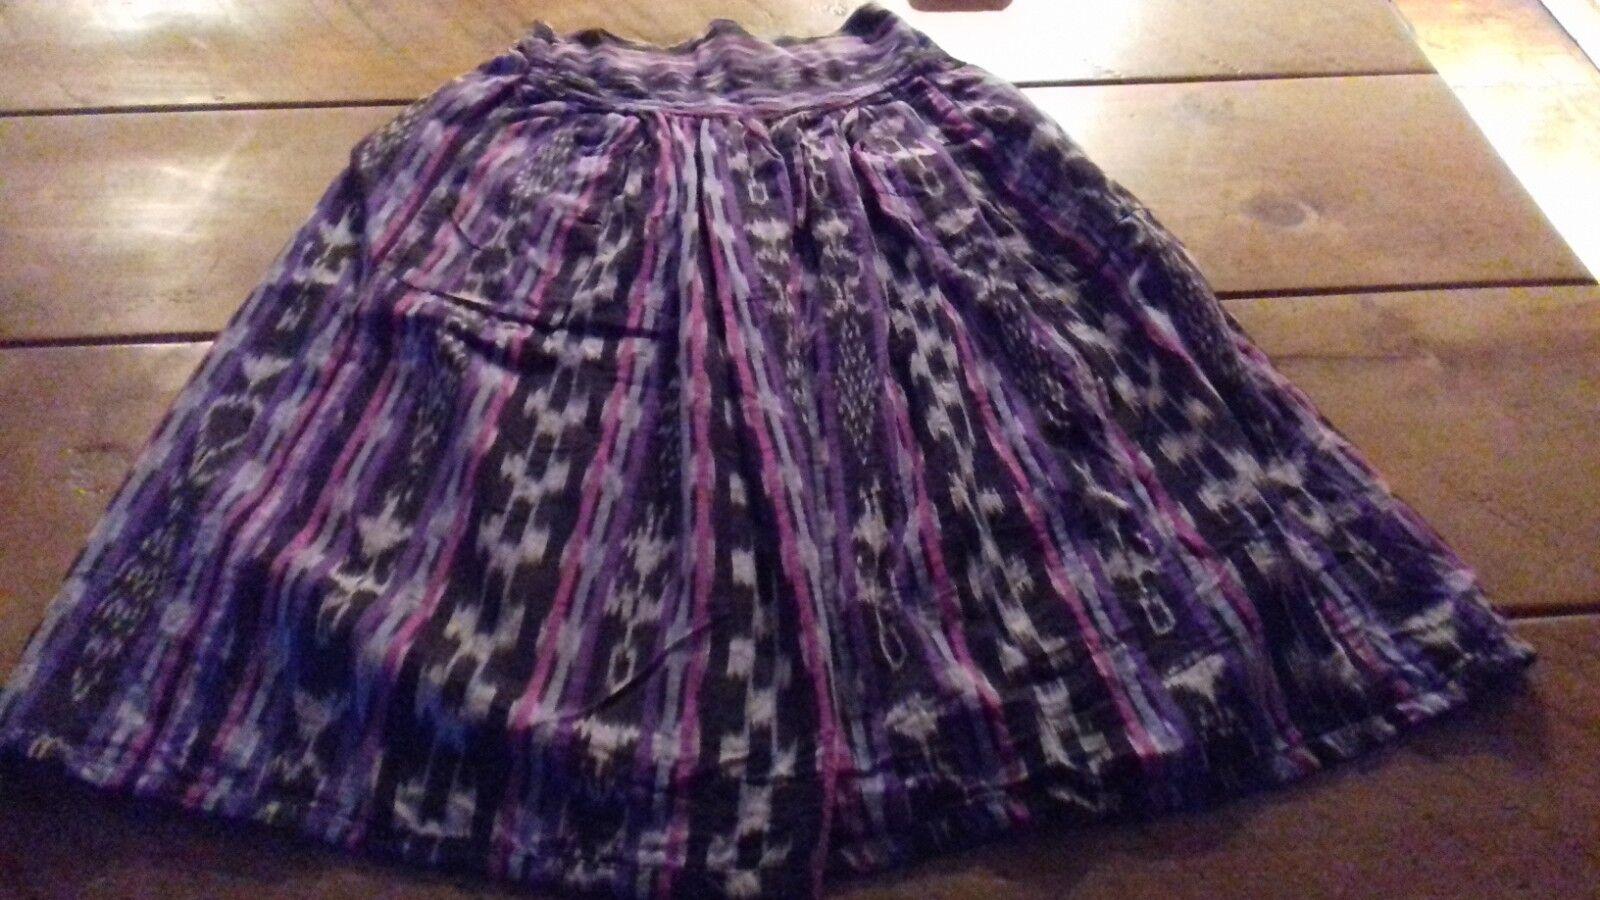 Multi-Coloured/Purple Women's Skirt - 100% Cotton - Made In Guatemala - Unworn